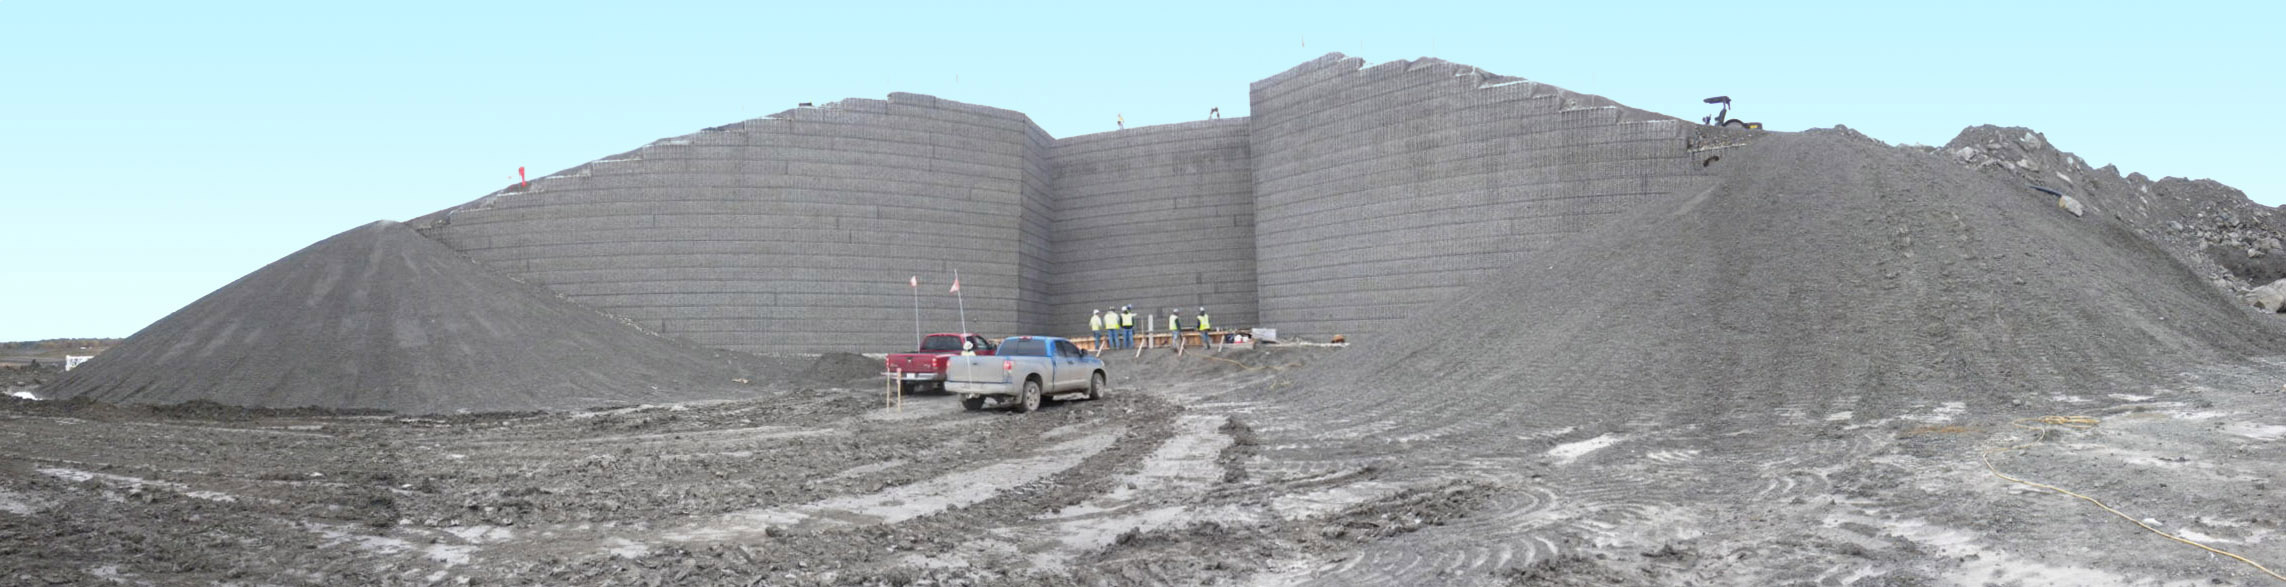 Bear Run Mining Project MSE Welded Wire Wall